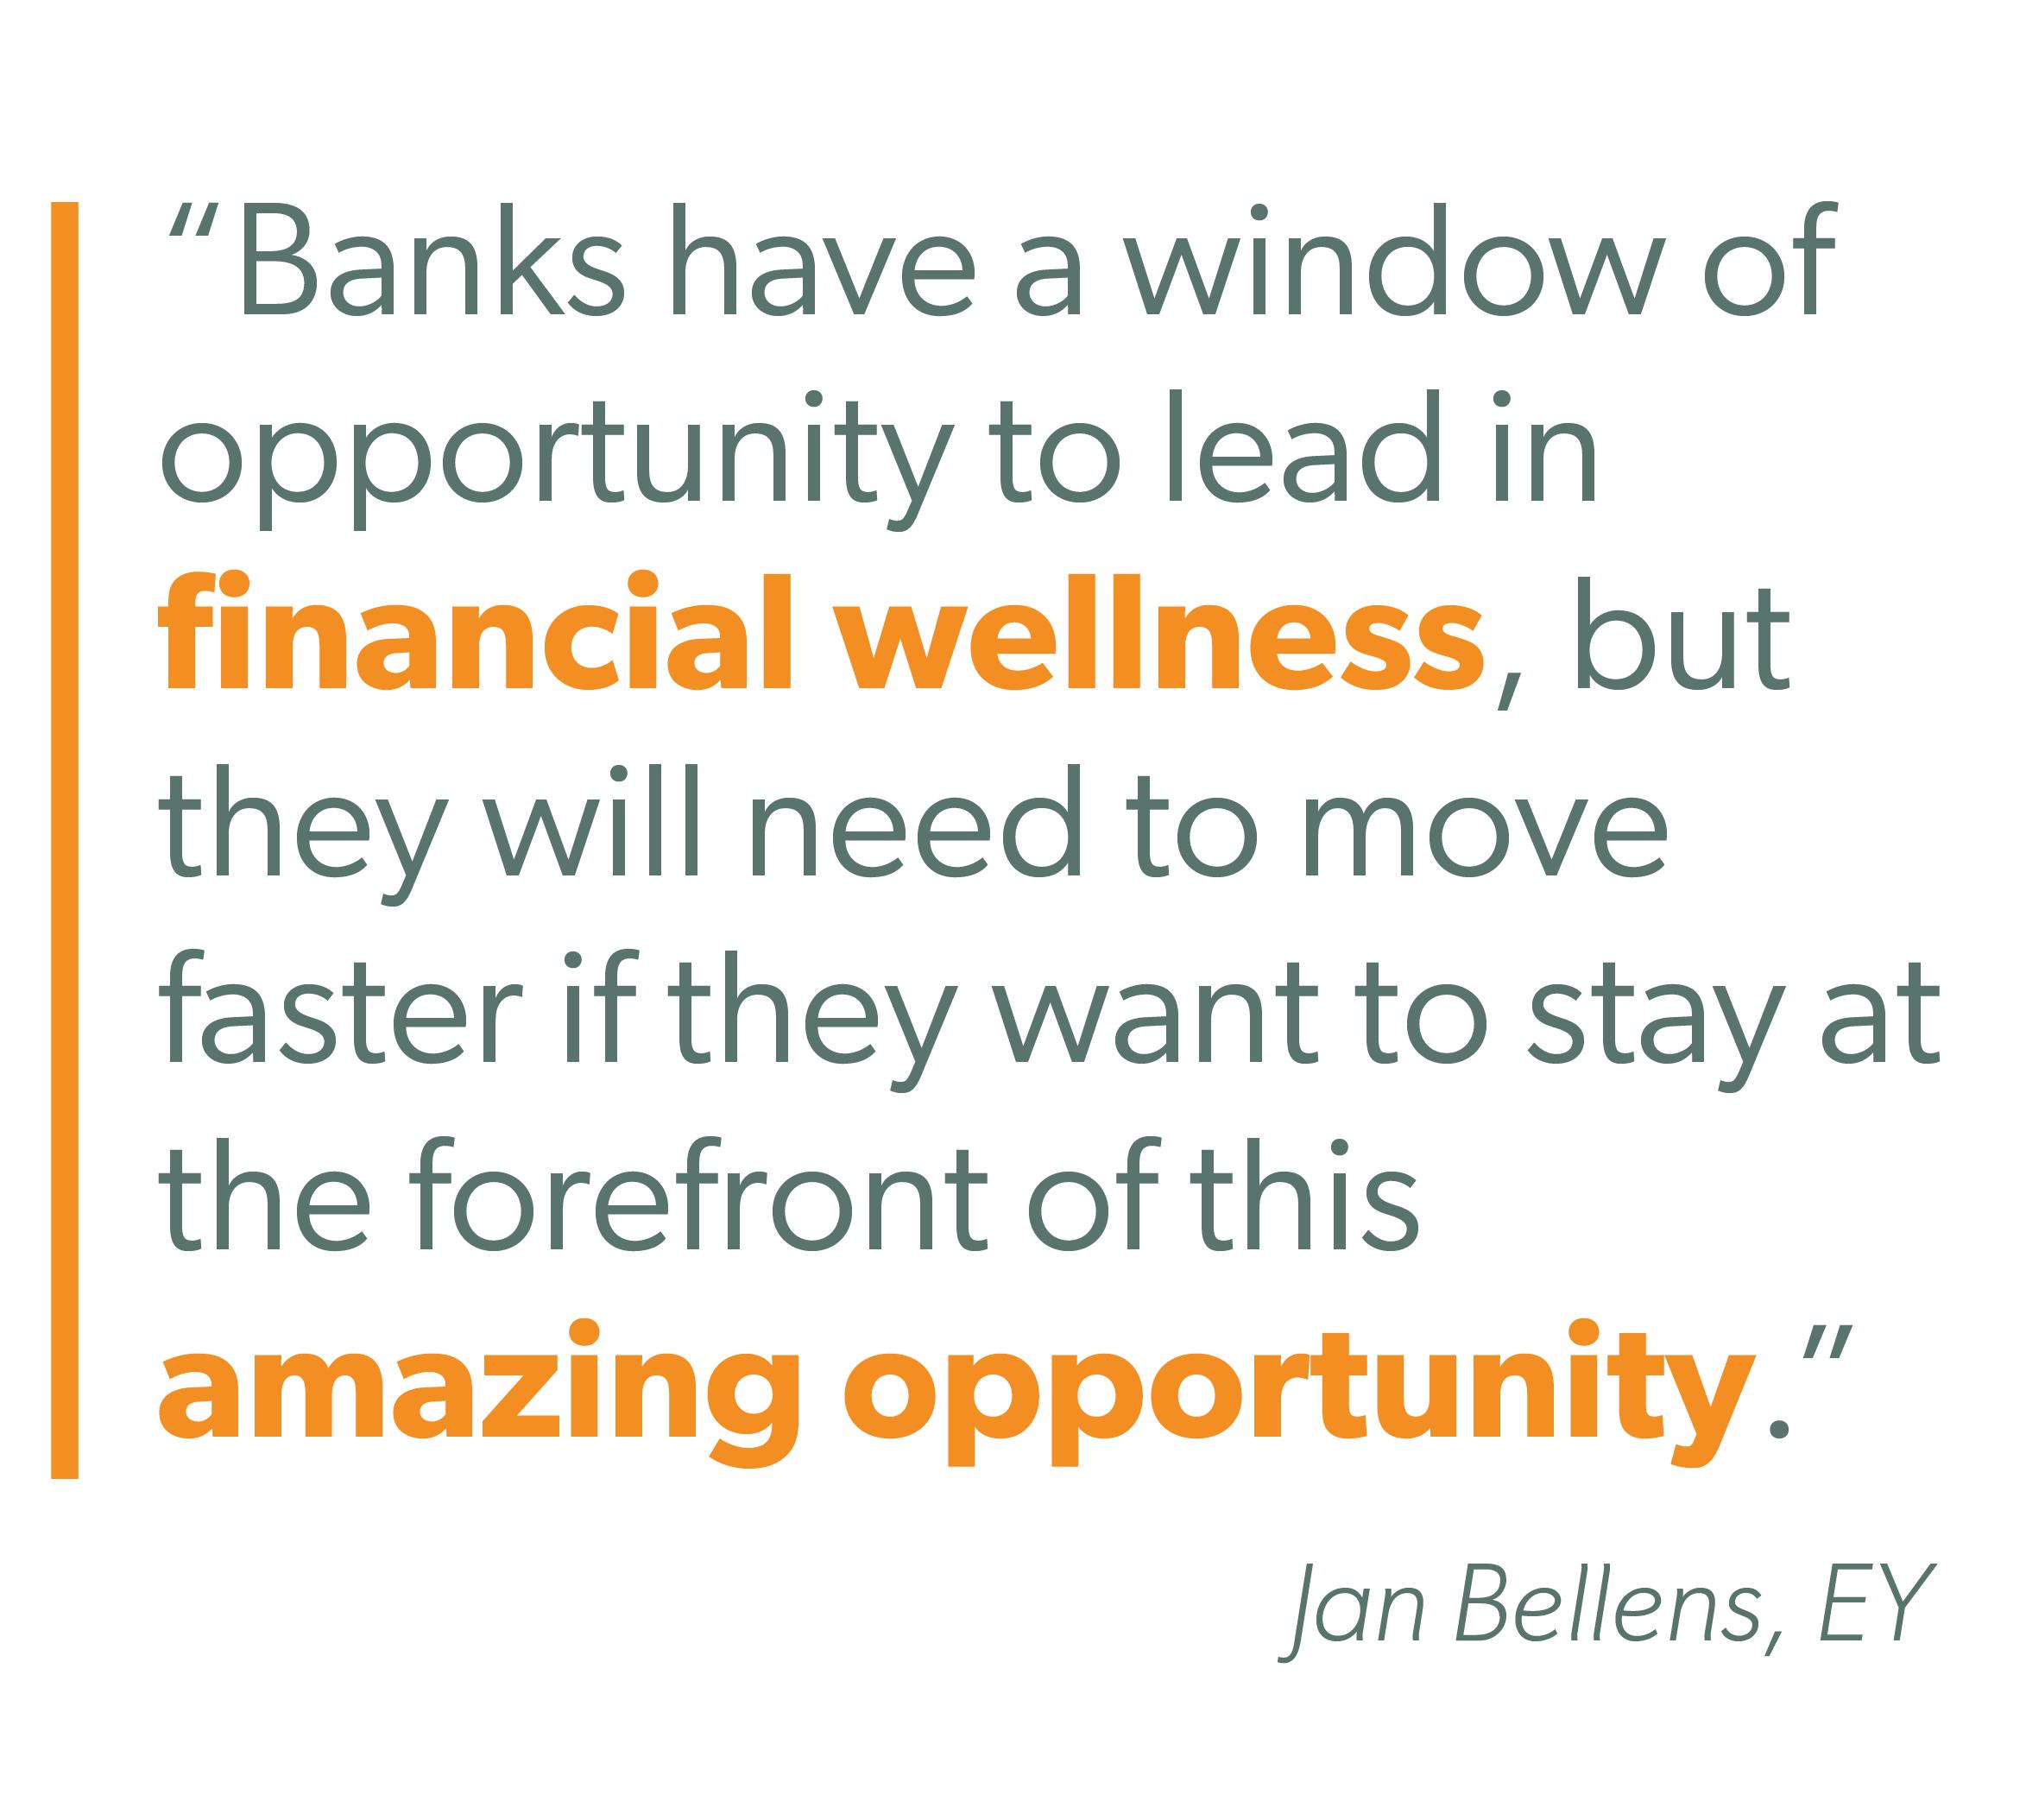 financial wellness plan for banks